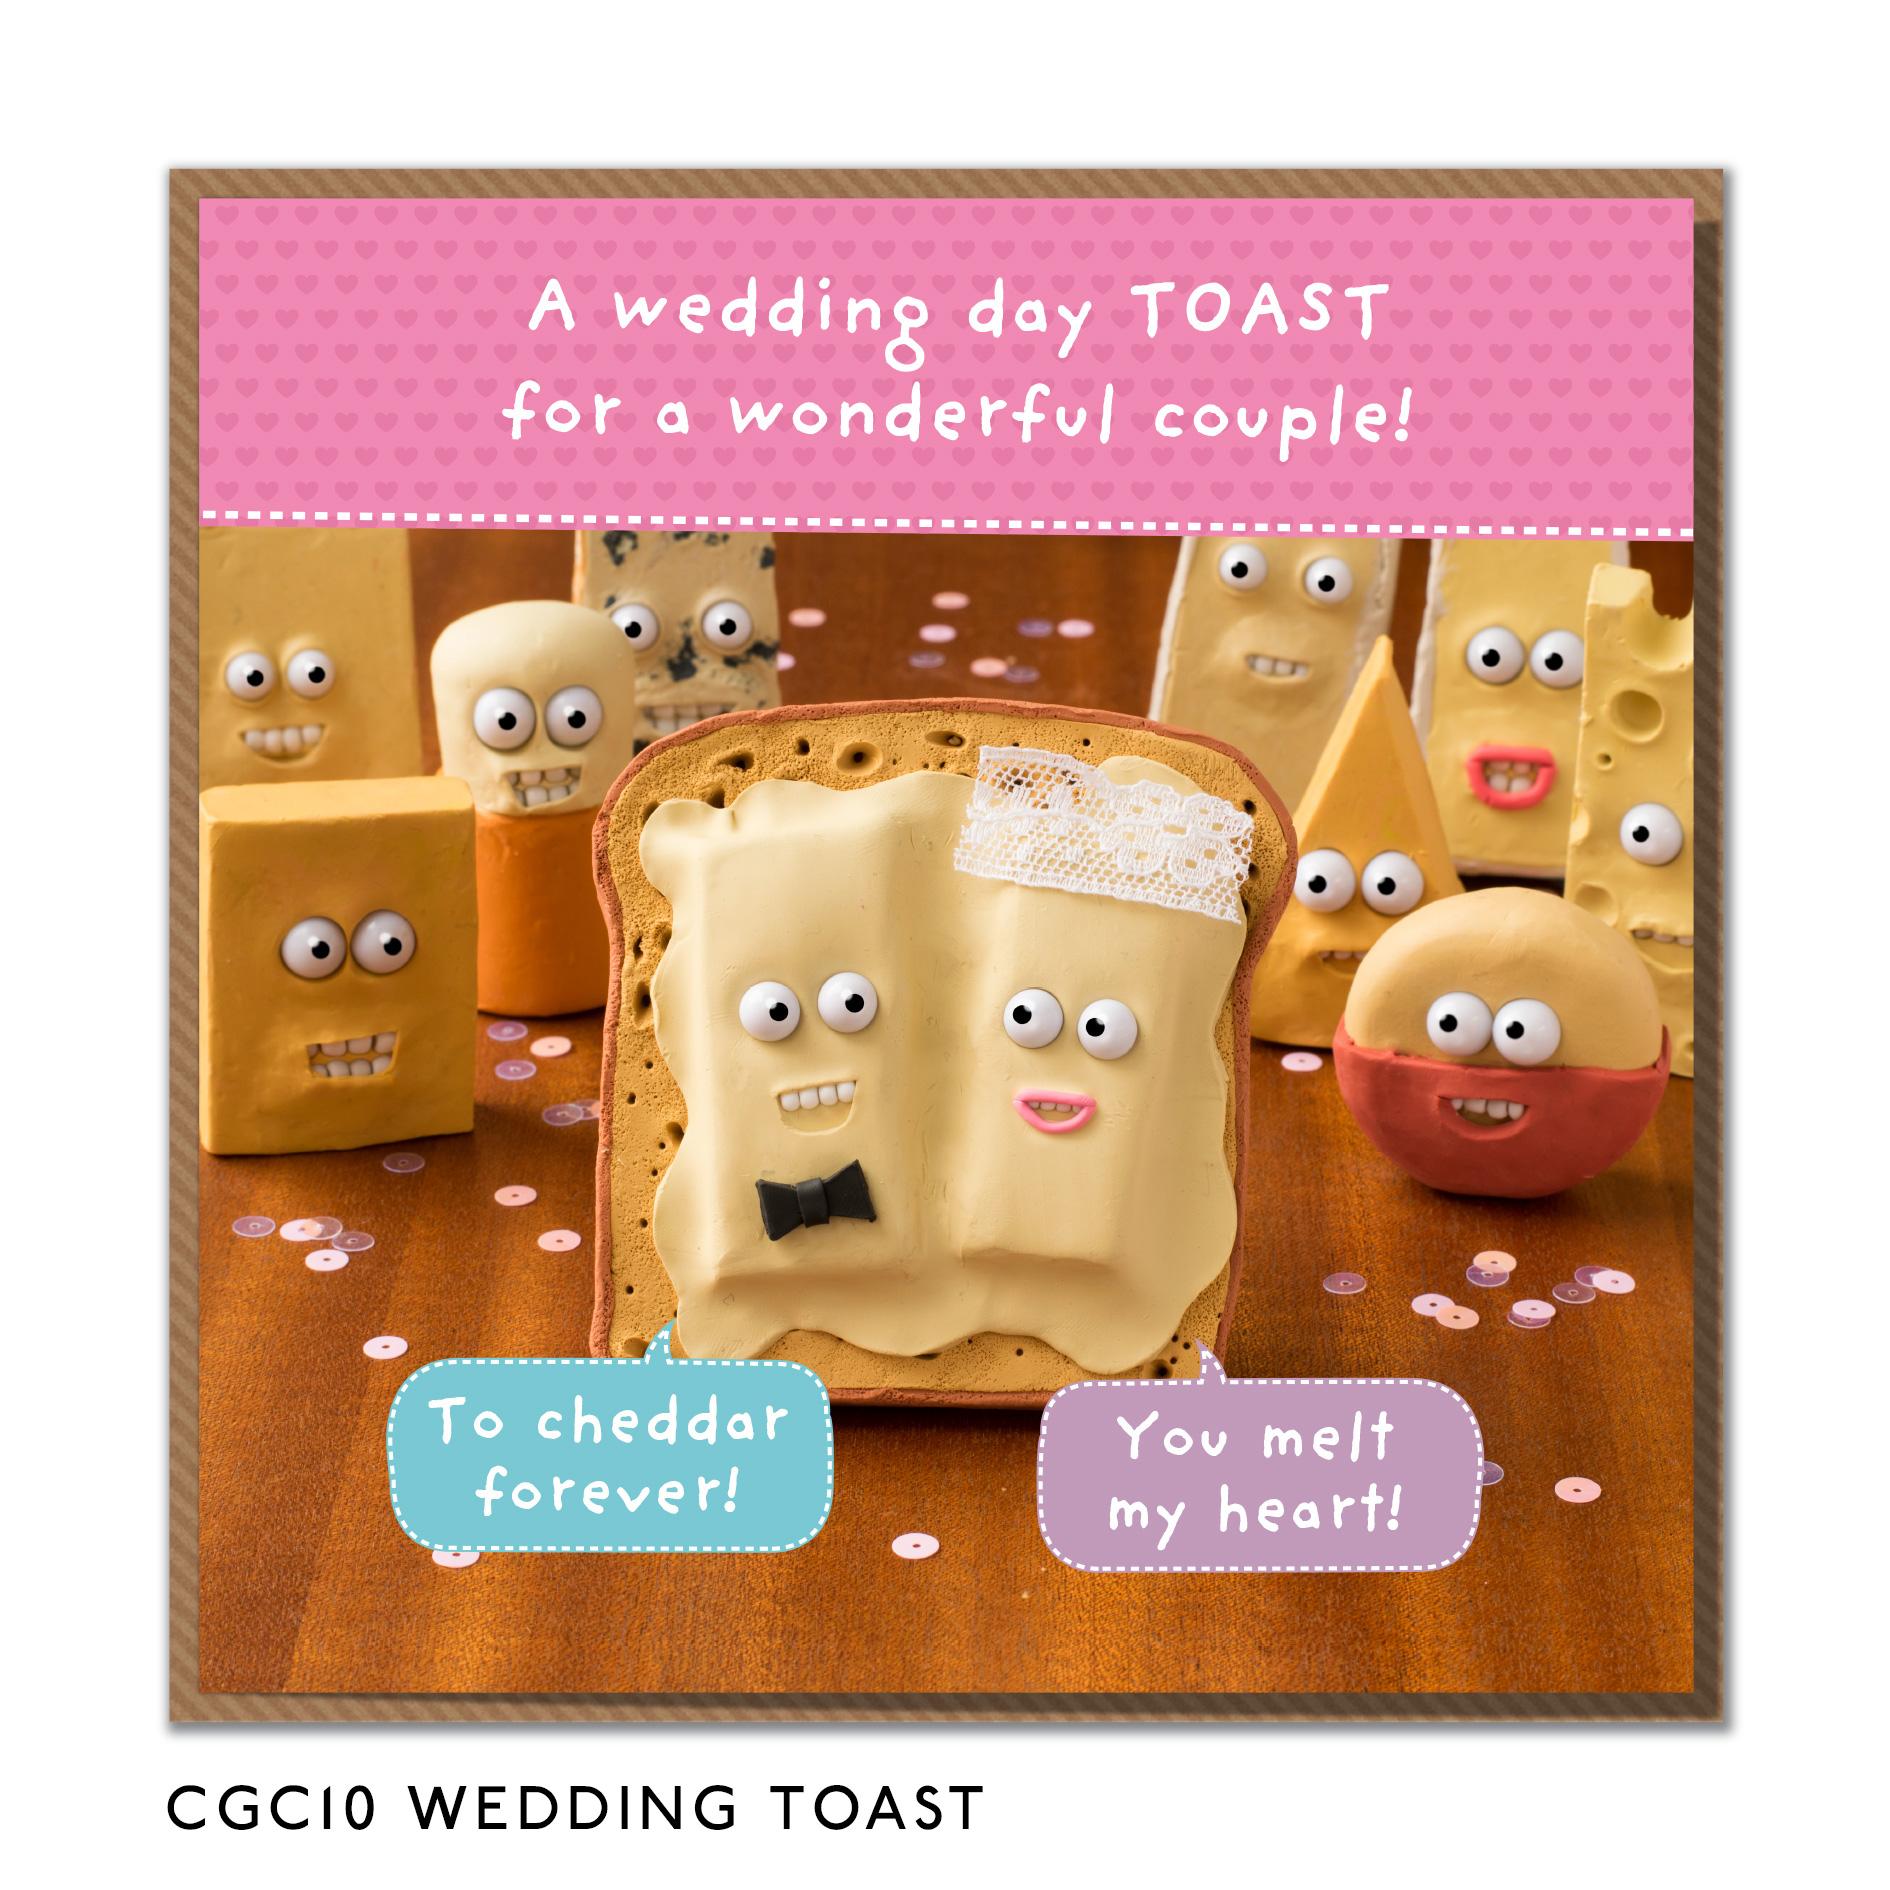 CGC10-WEDDING-TOAST.jpg